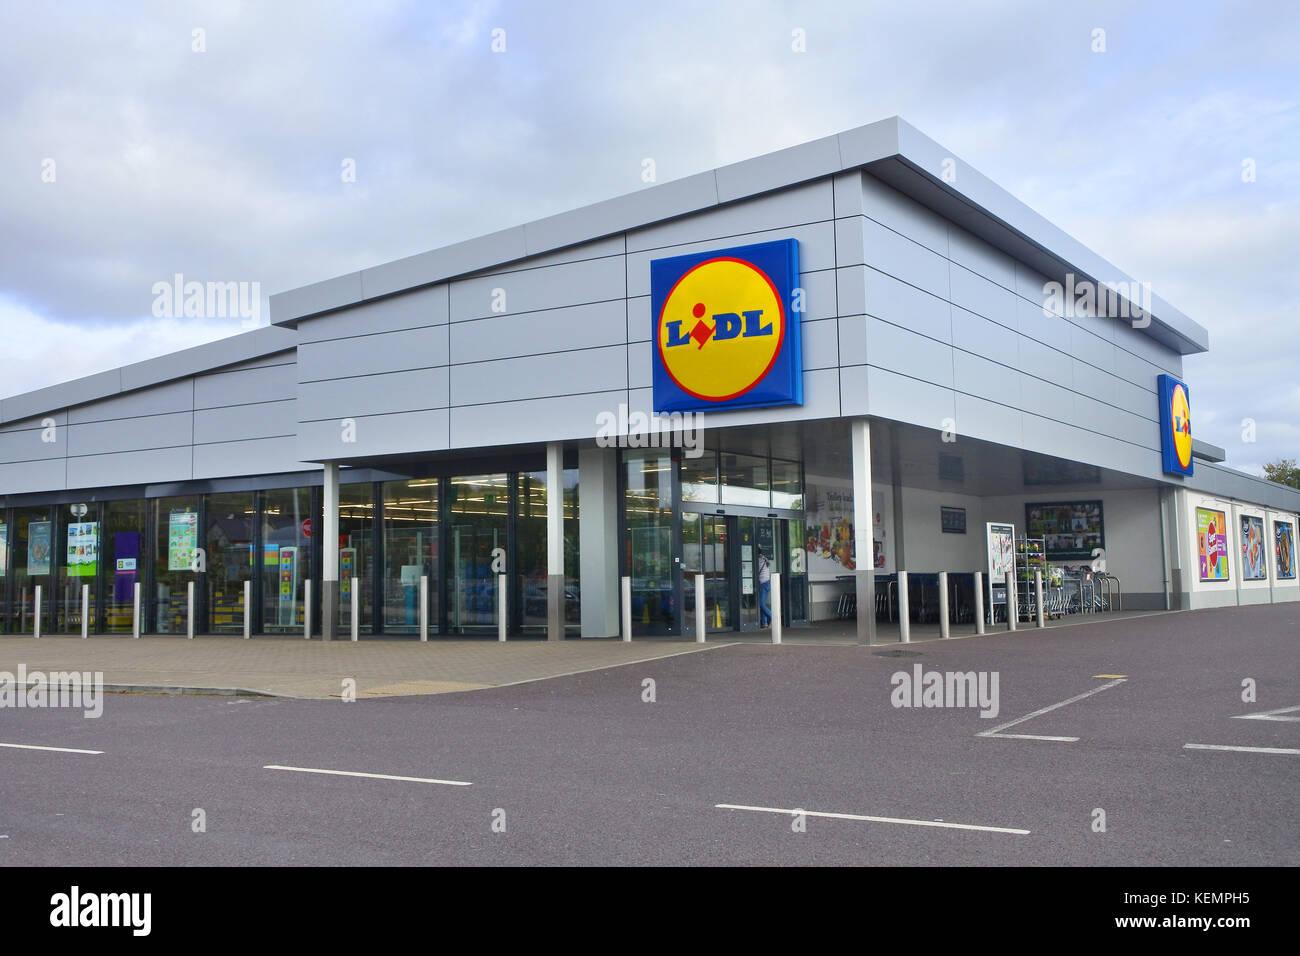 Supermarket Germany Lidl Stock Photos & Supermarket Germany Lidl Stock Images - Alamy